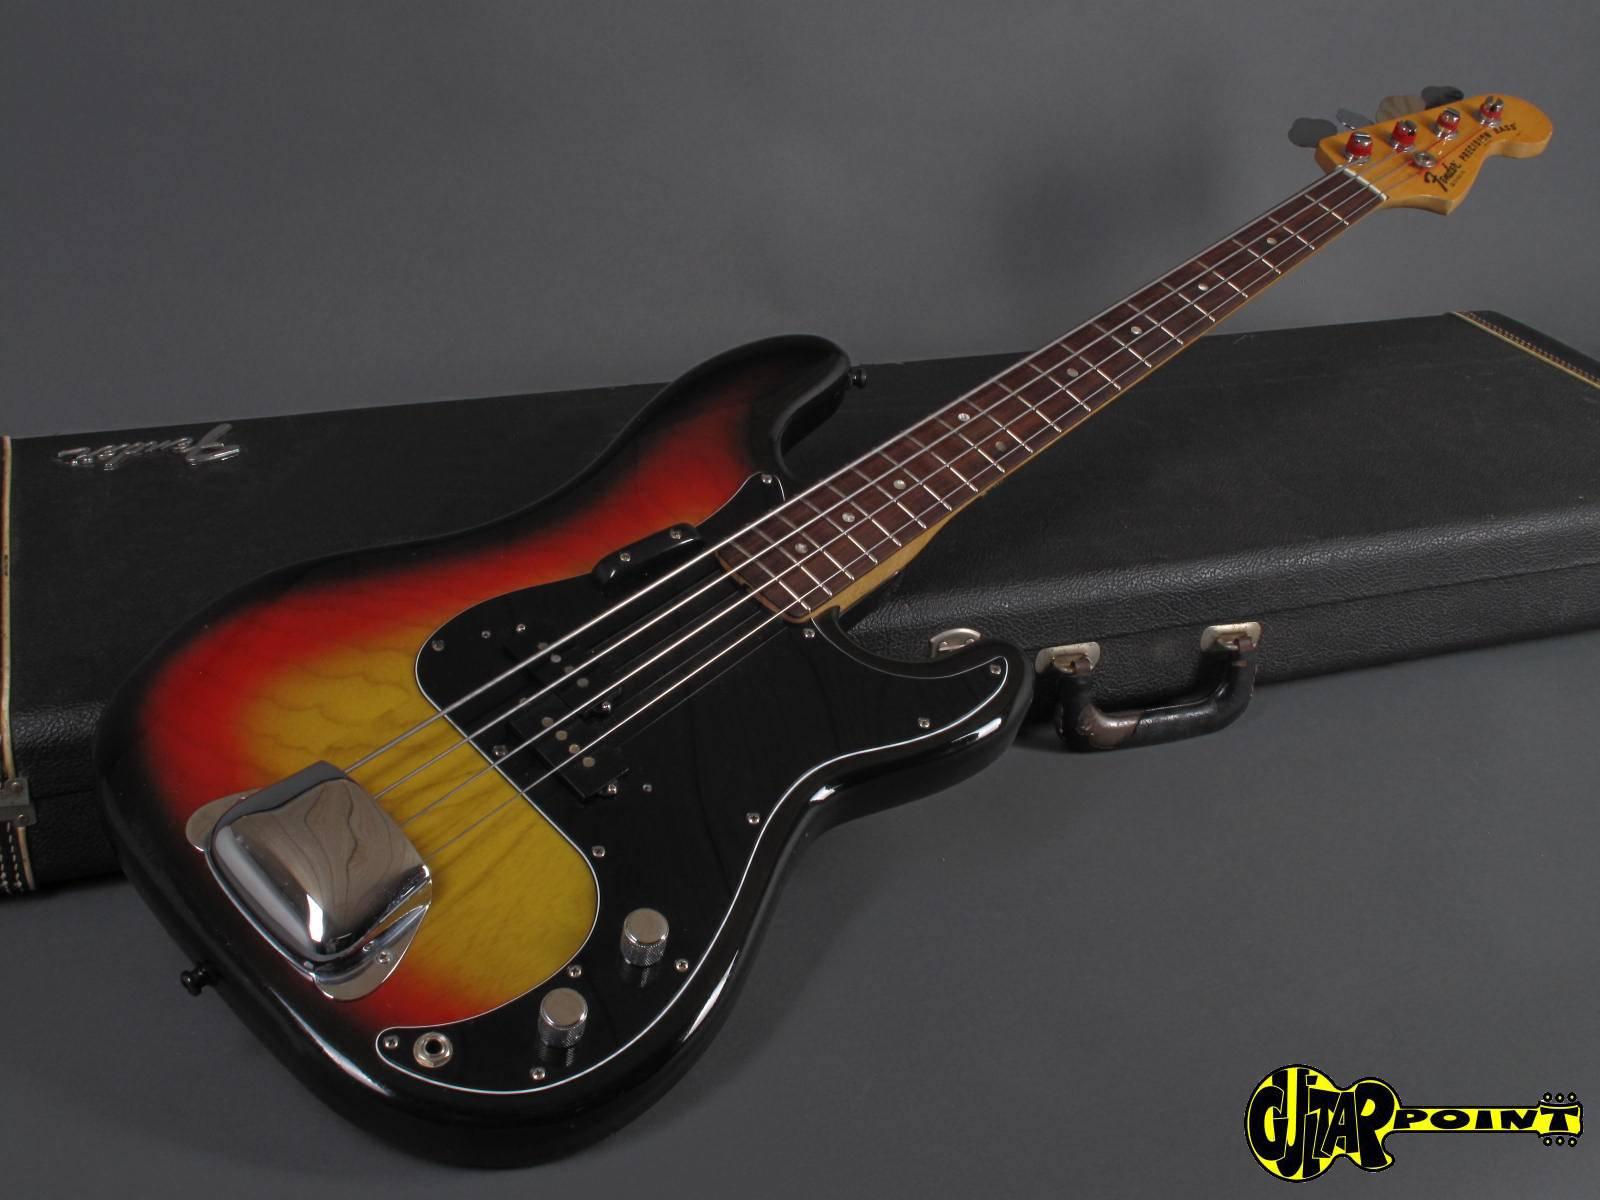 fender precision p bass 1978 3t sunburst bass for sale guitarpoint. Black Bedroom Furniture Sets. Home Design Ideas